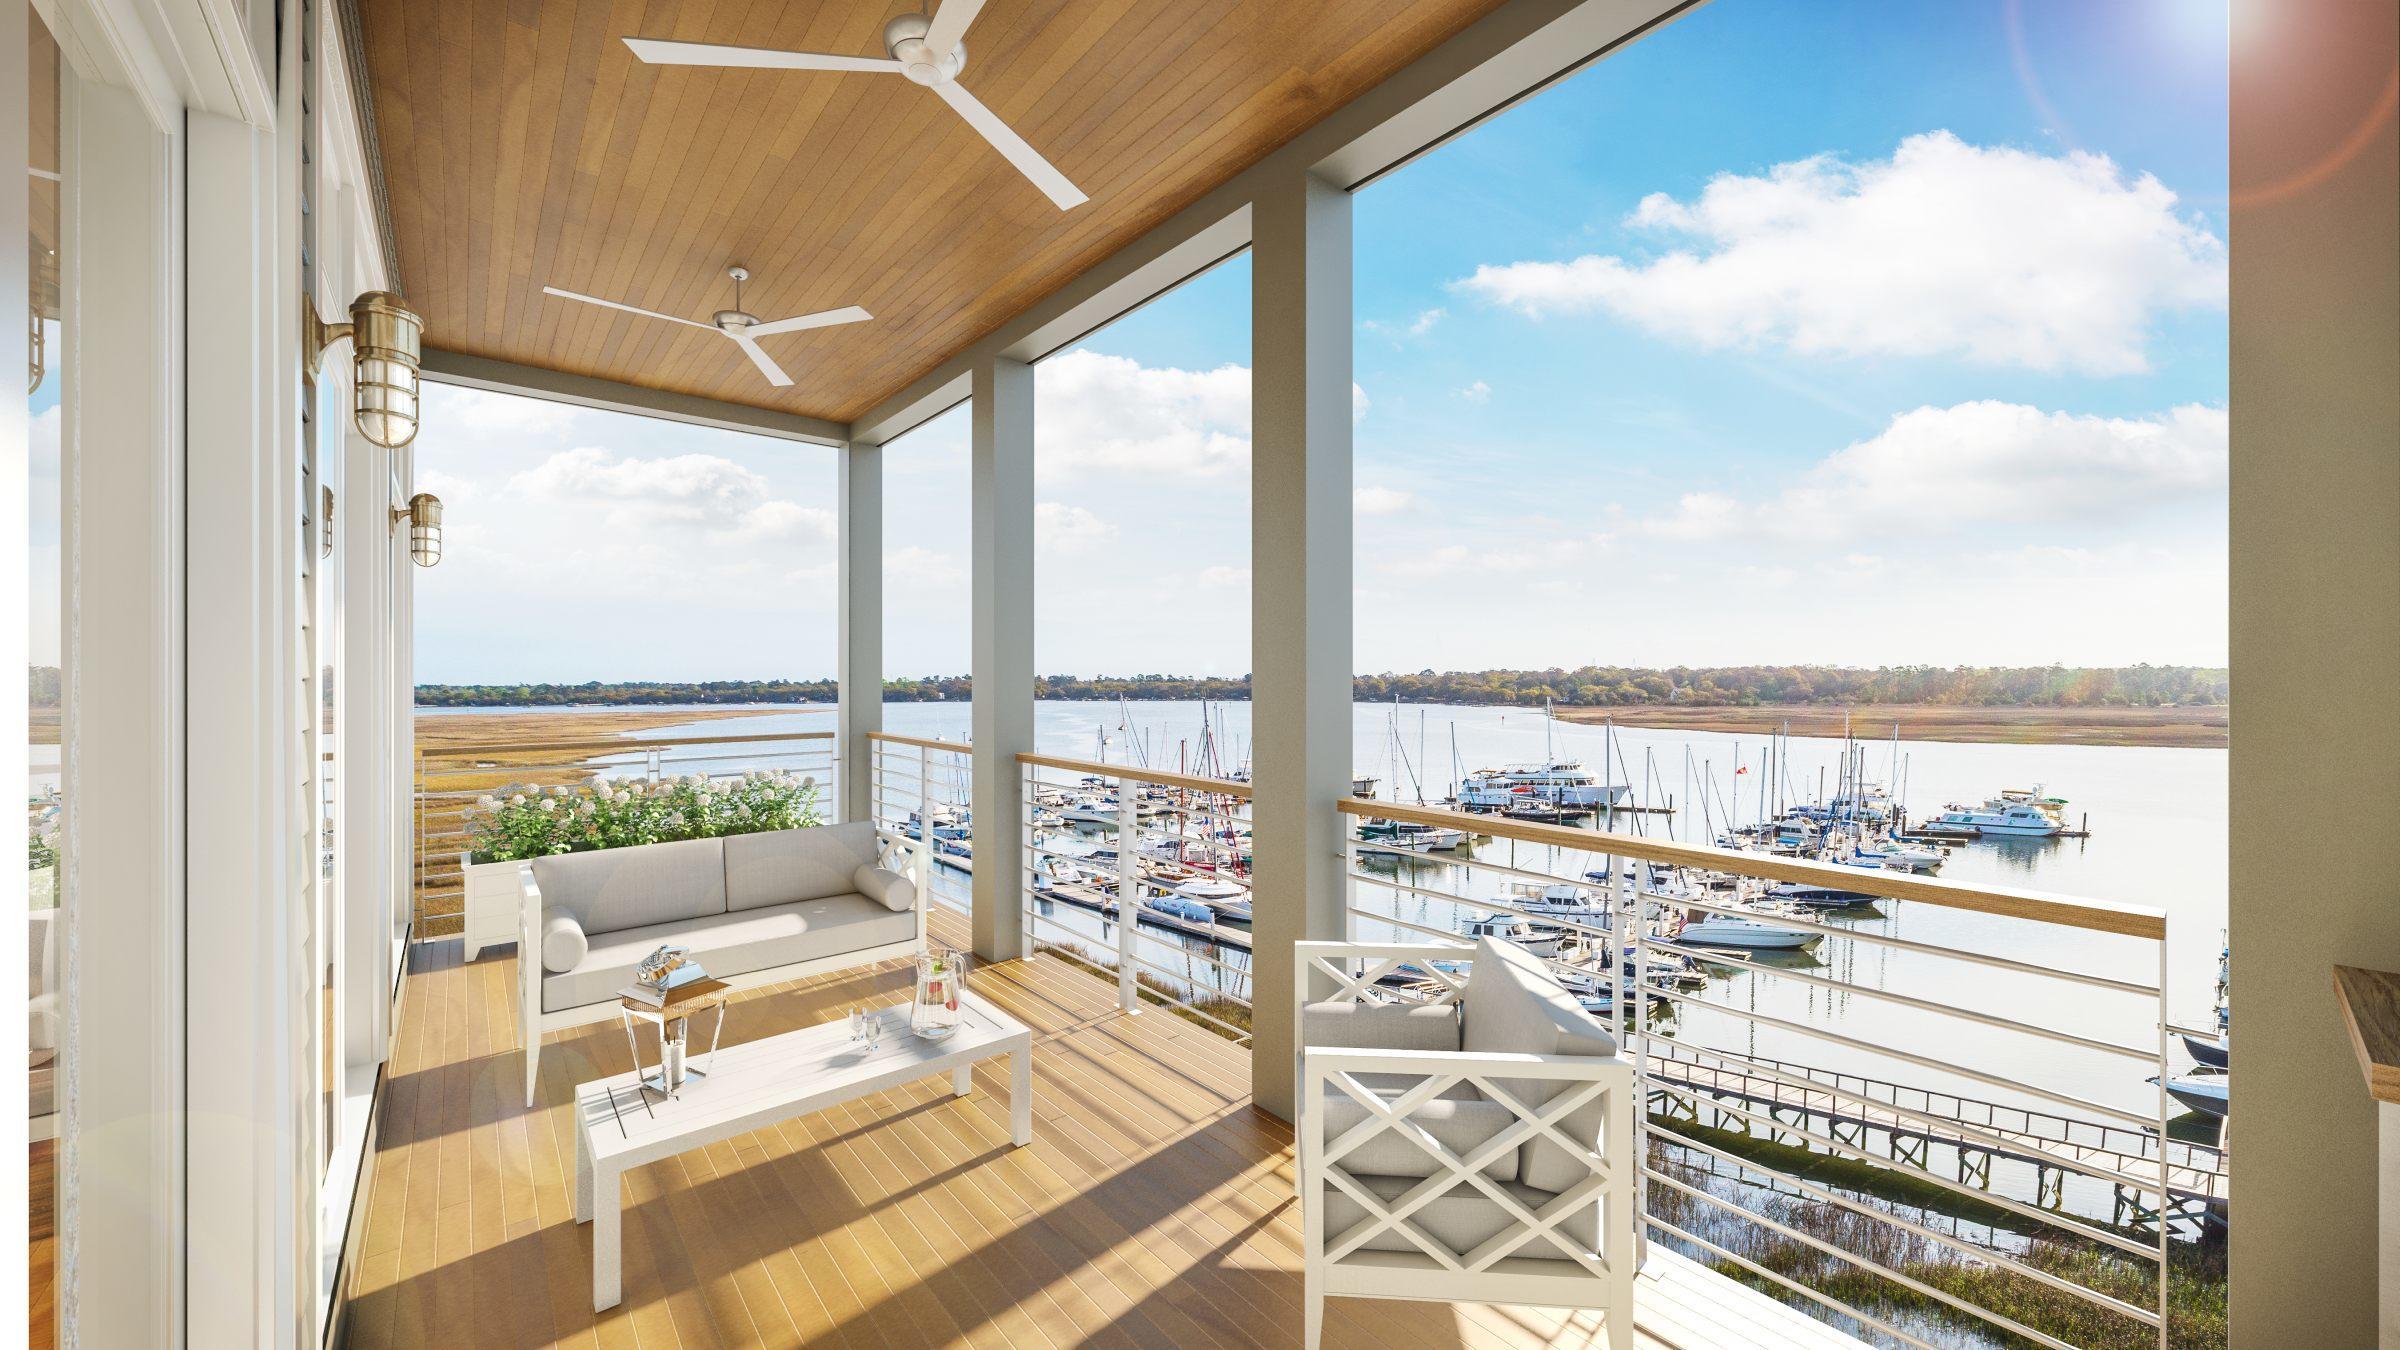 St. Johns Yacht Harbor Homes For Sale - 2408 Maybank, Johns Island, SC - 2